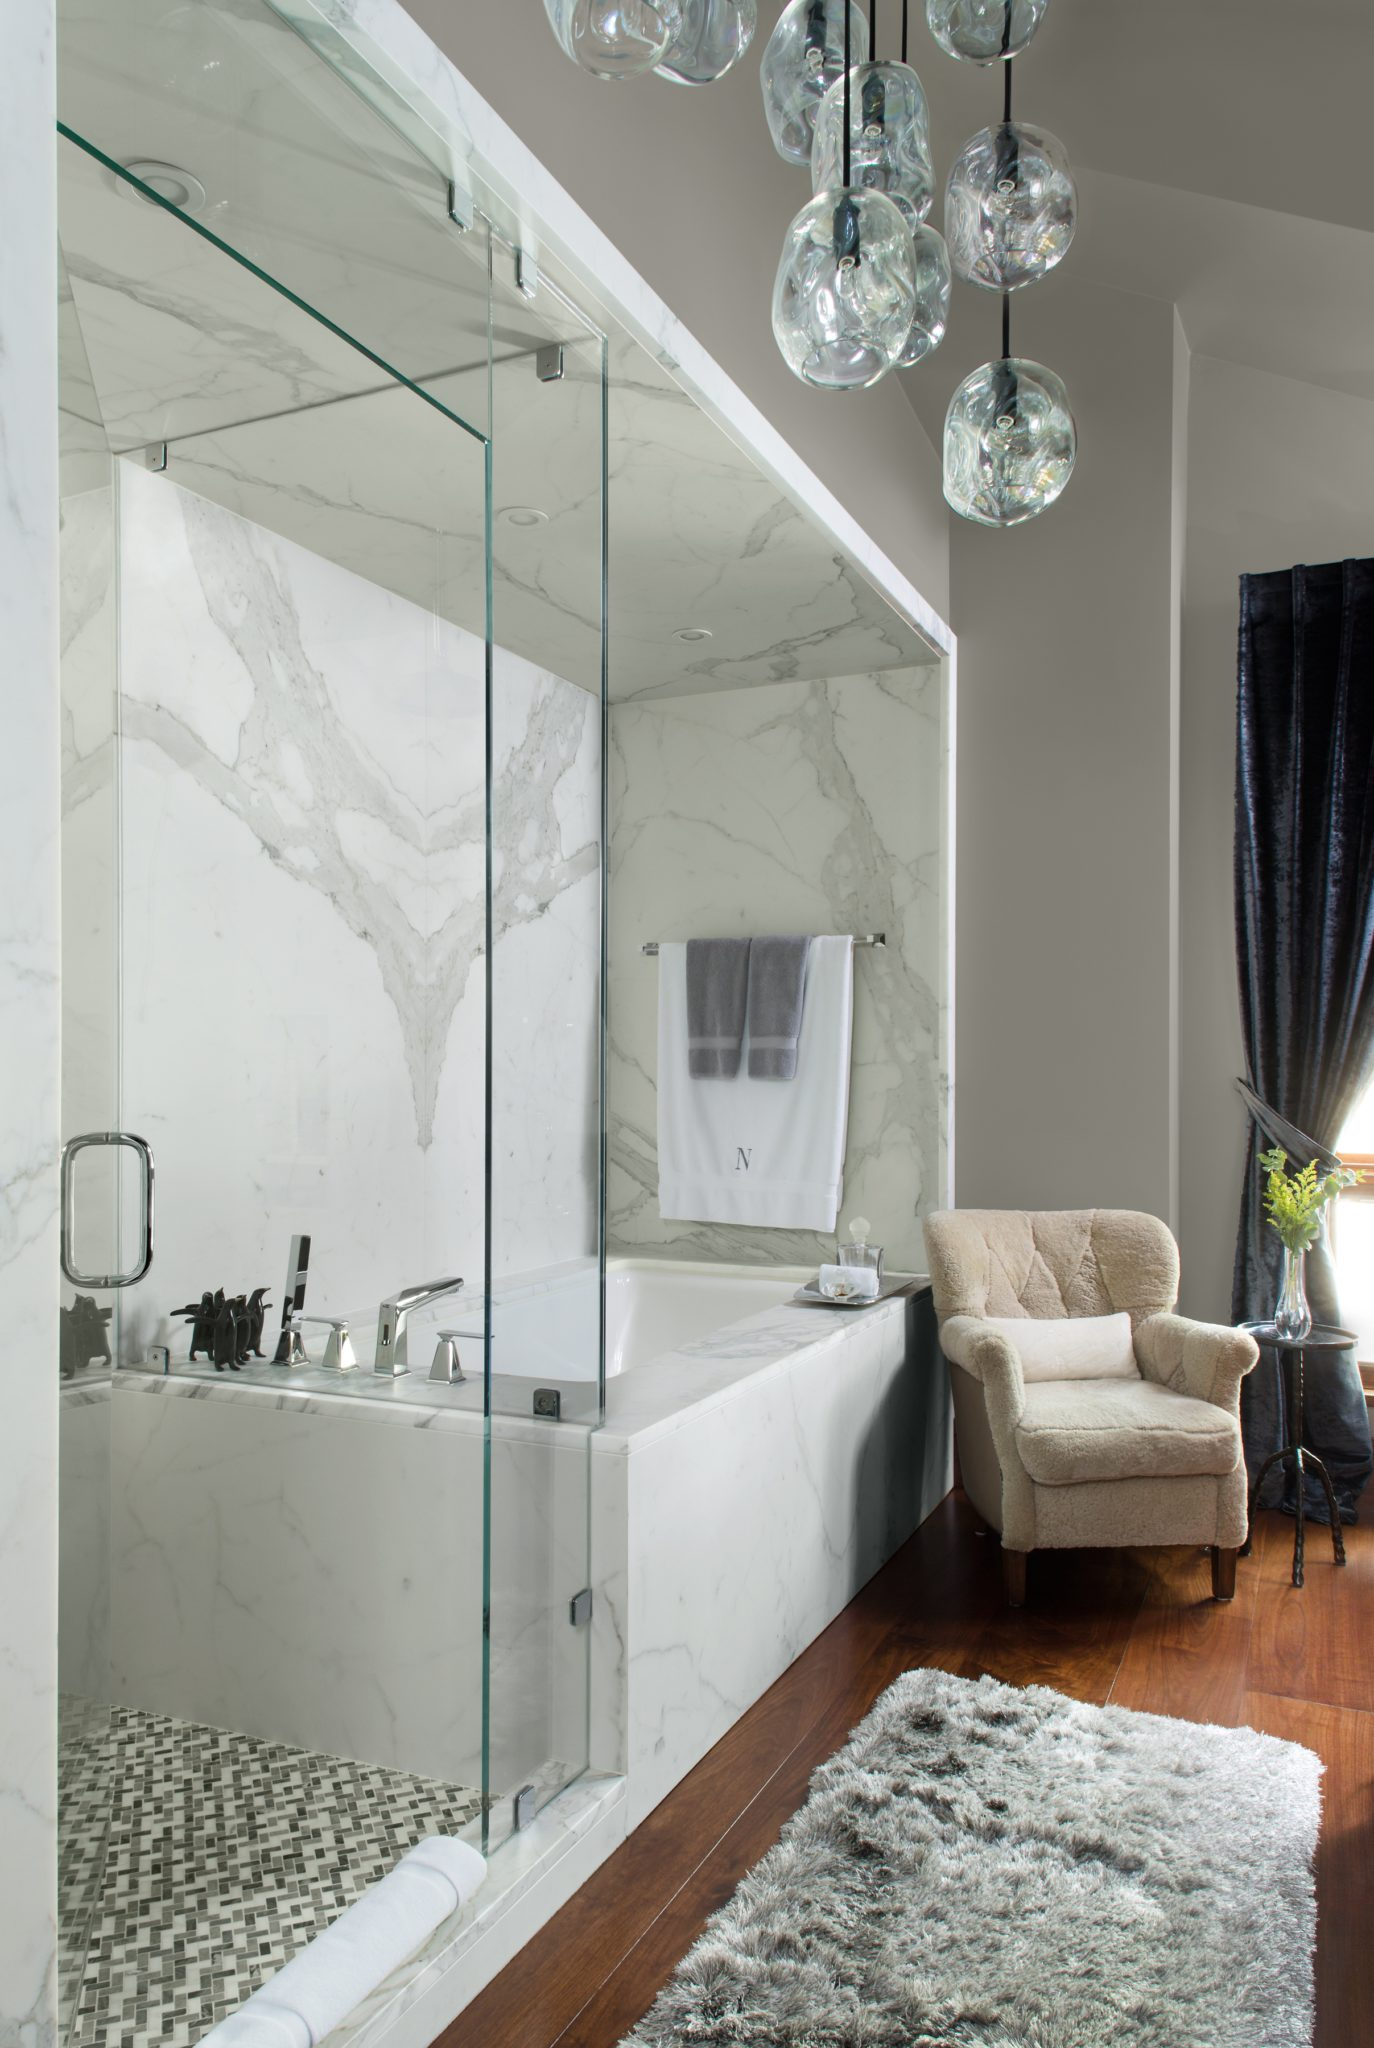 Elegant and sophisticated bathroom - Beaver Creek, CO, by Slifer Designs